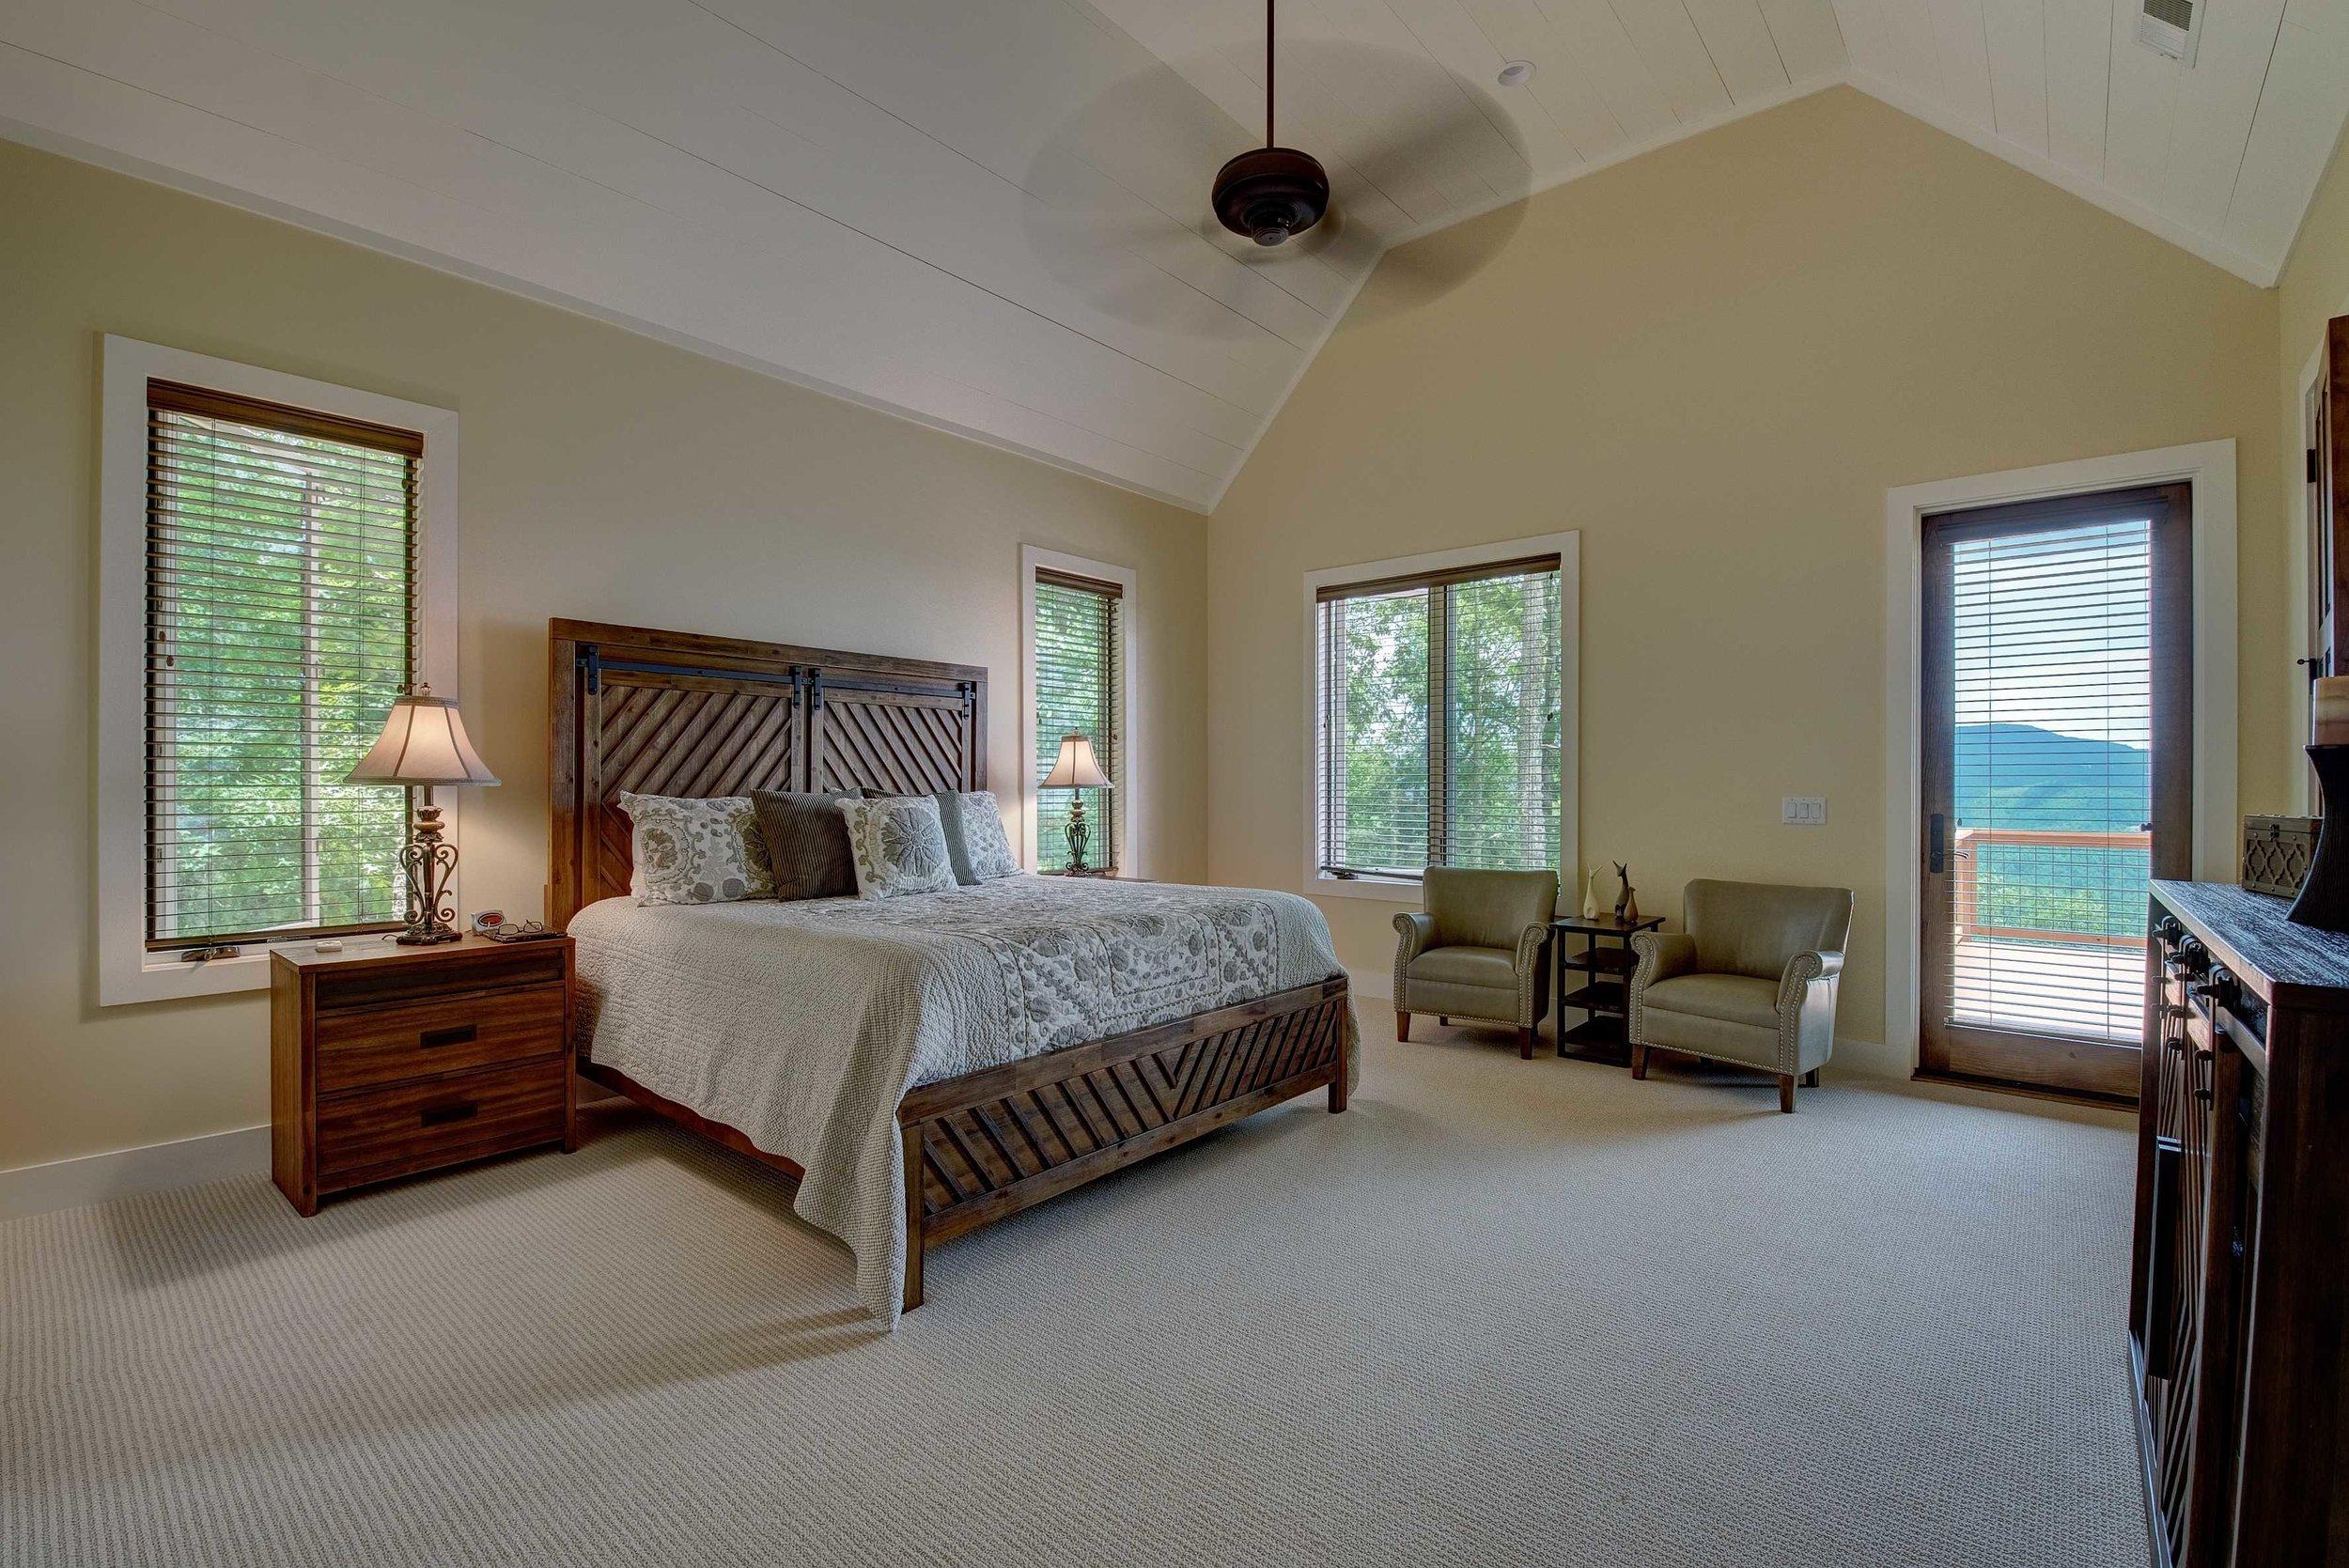 10 Master Bedroom Halbrook.jpeg